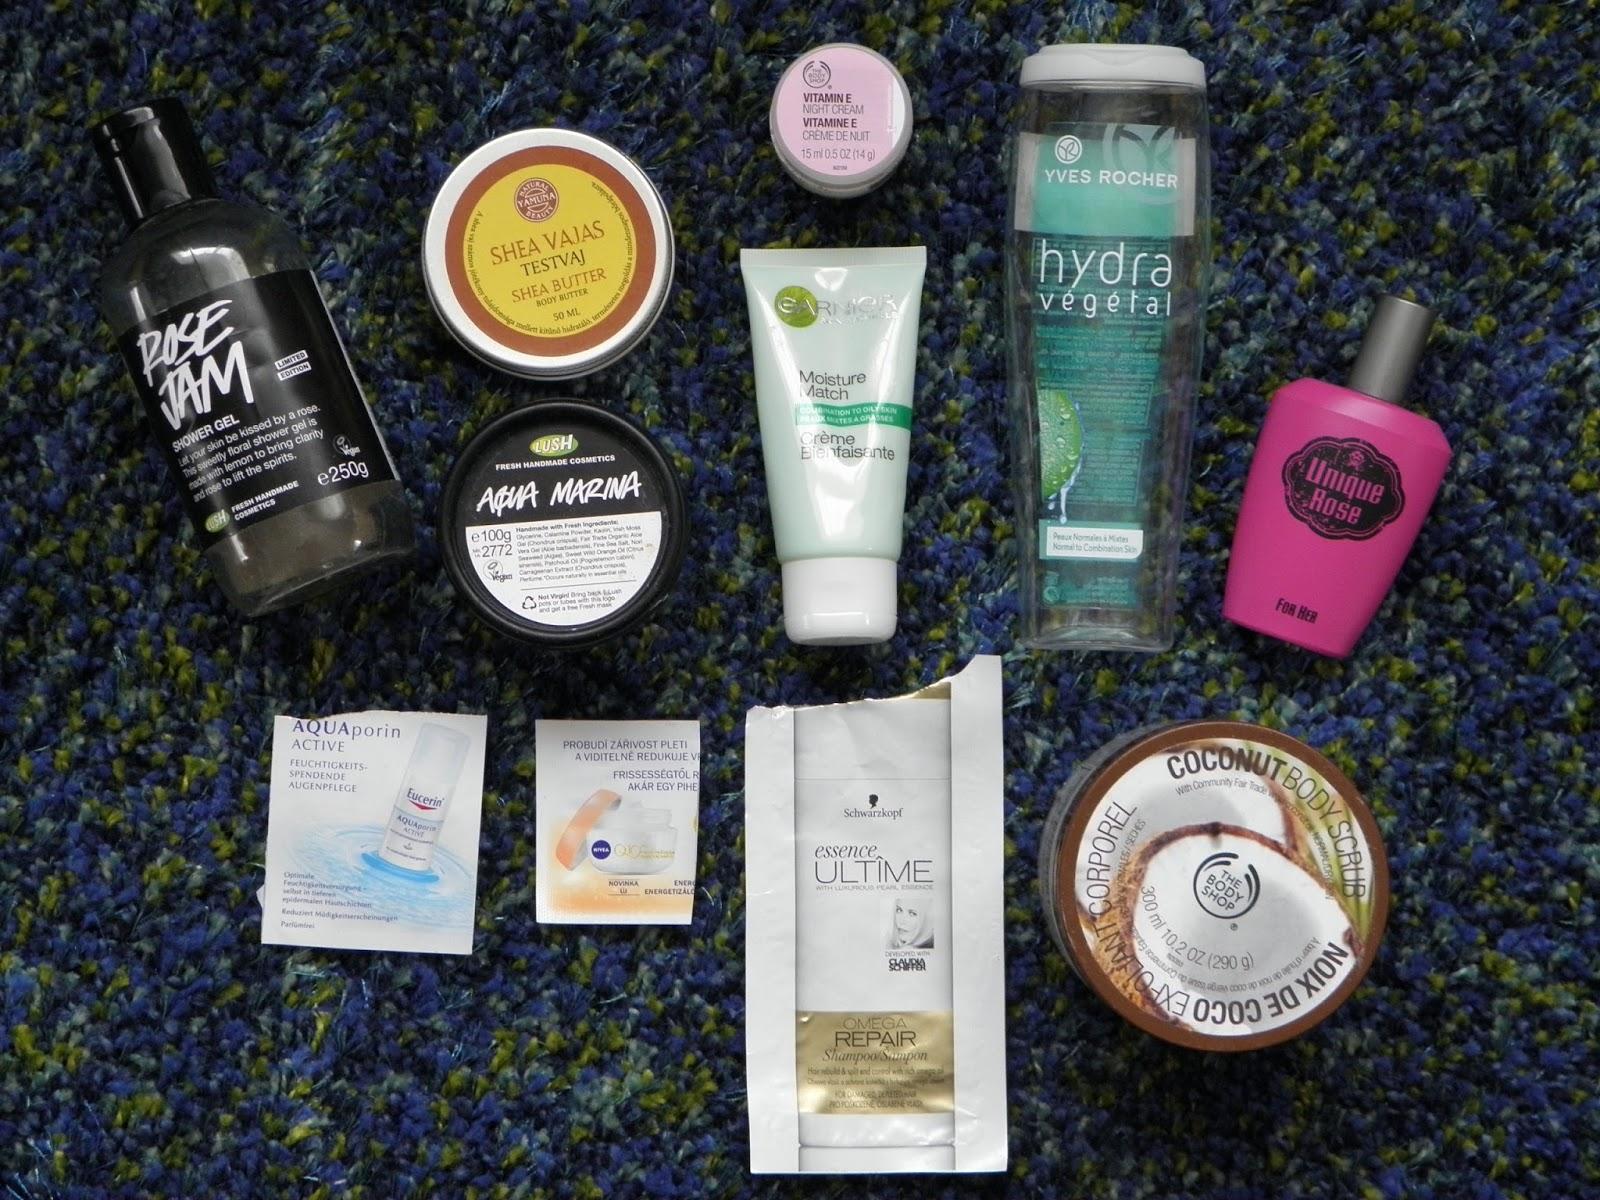 2048e8b8e1 Elfogyott termékek: 2015/4.: Lush, The Body Shop, Yves Rocher, Garnier,  Yamuna, AVON, Schwarzkopf, Eucerin, Nivea